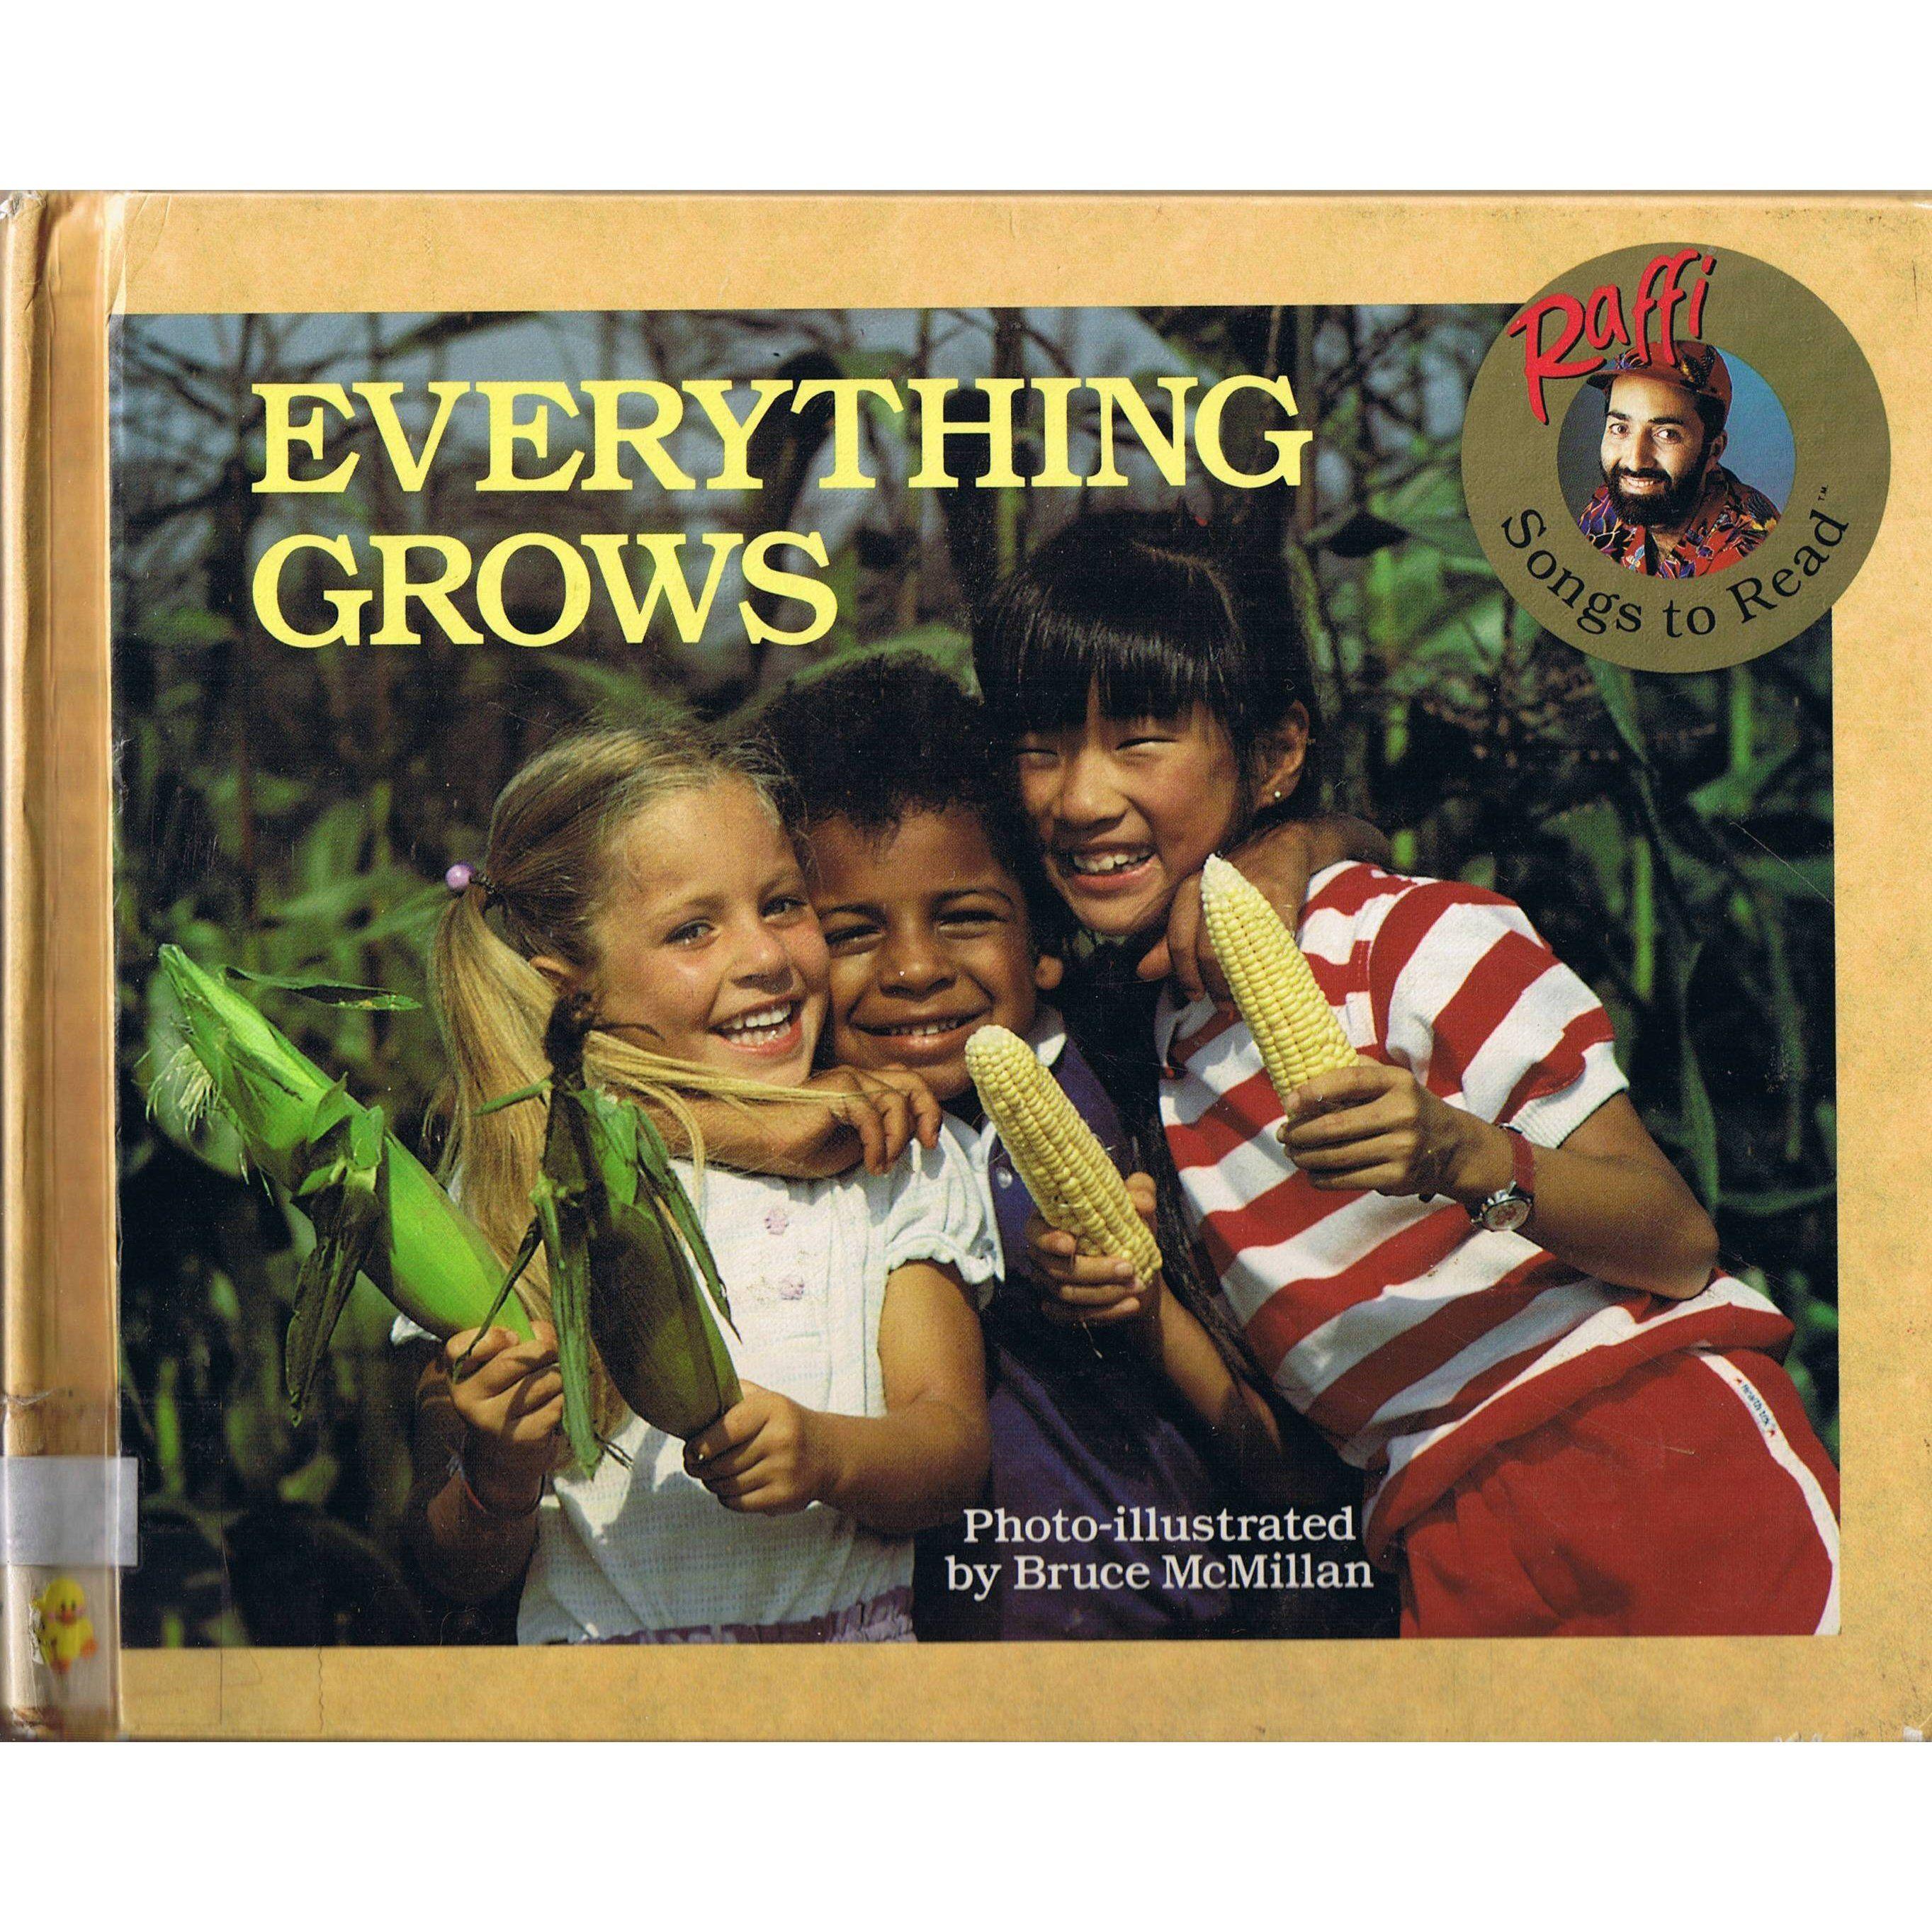 Raffi And Bruce Mcmillan  Raffi Songs To Read Everything